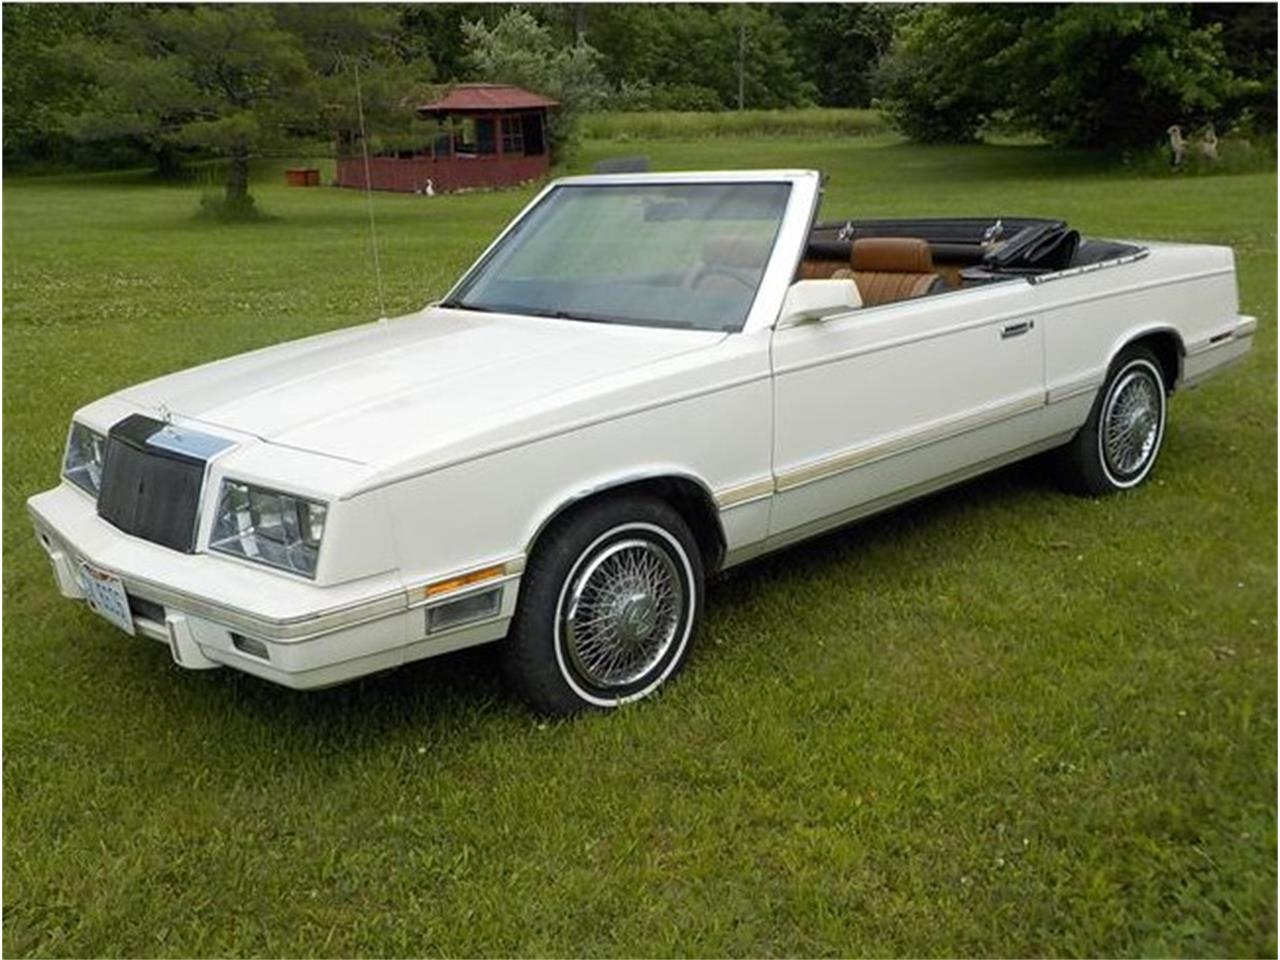 1983 Chrysler LeBaron (CC-1102337) for sale in Chardon, Ohio